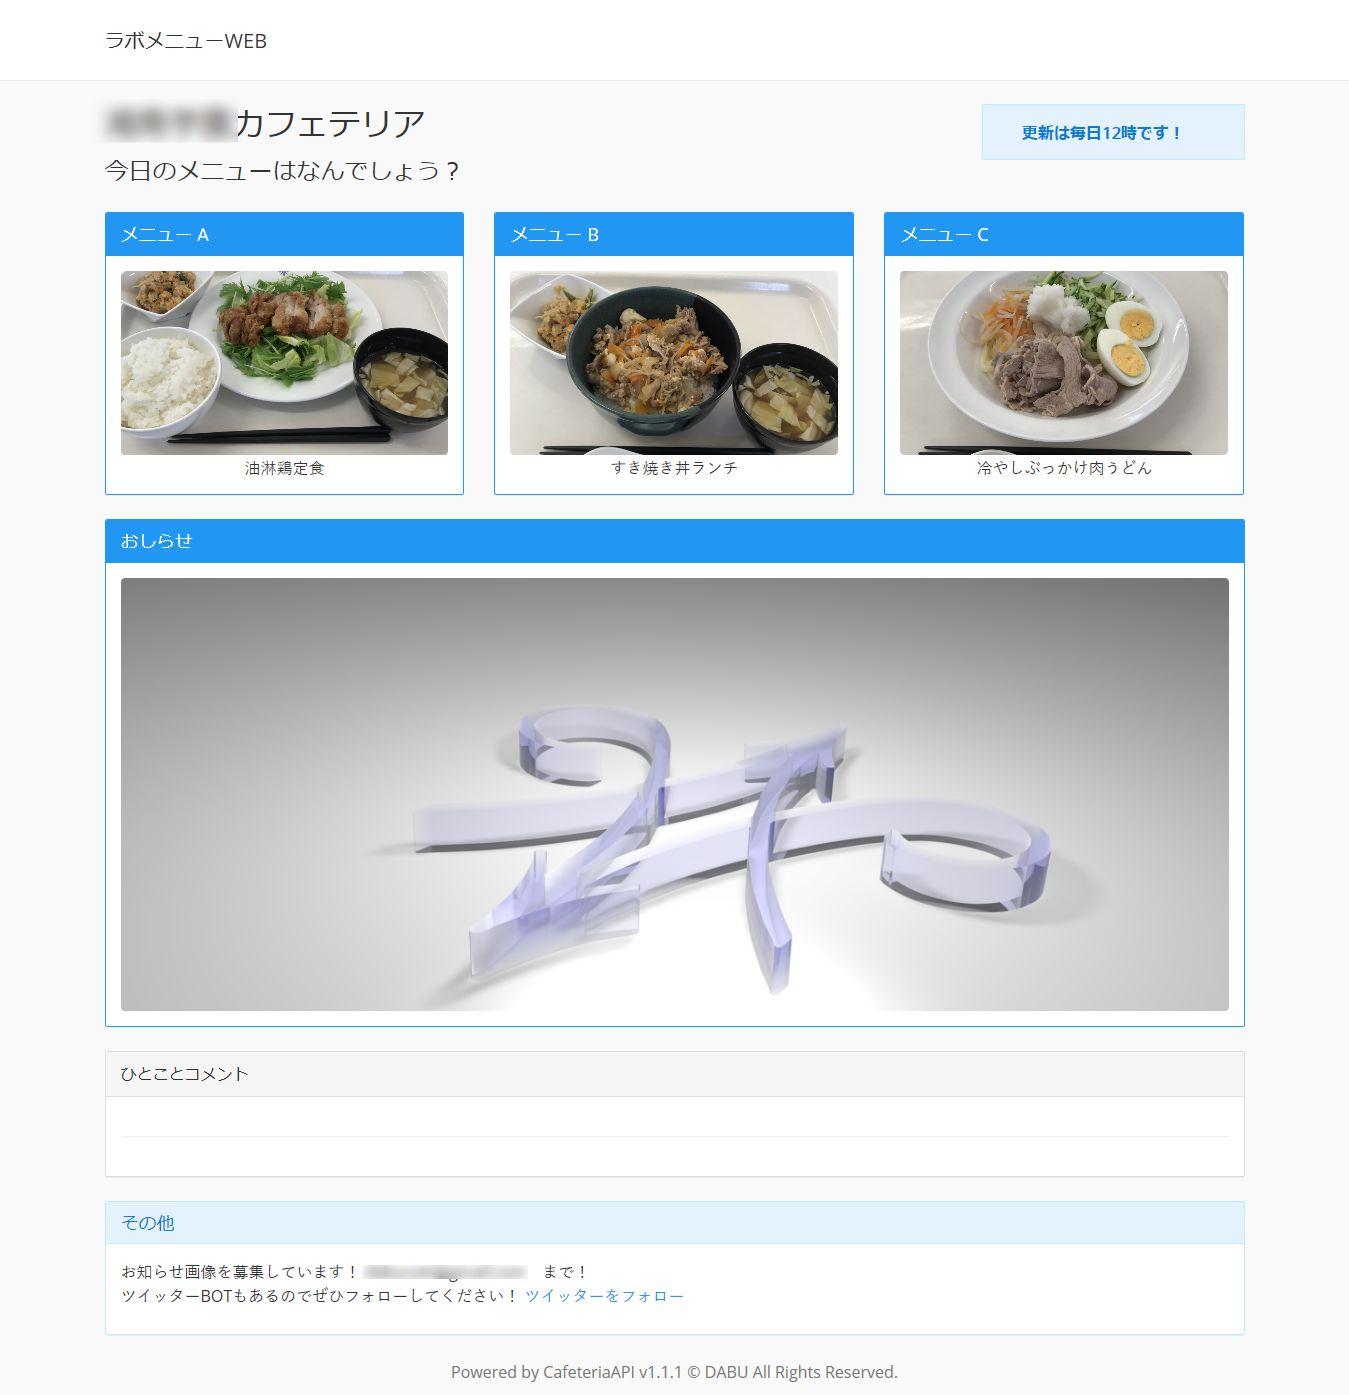 Screenshot-2018-7-5 ラボメニューWEB_censored.jpg